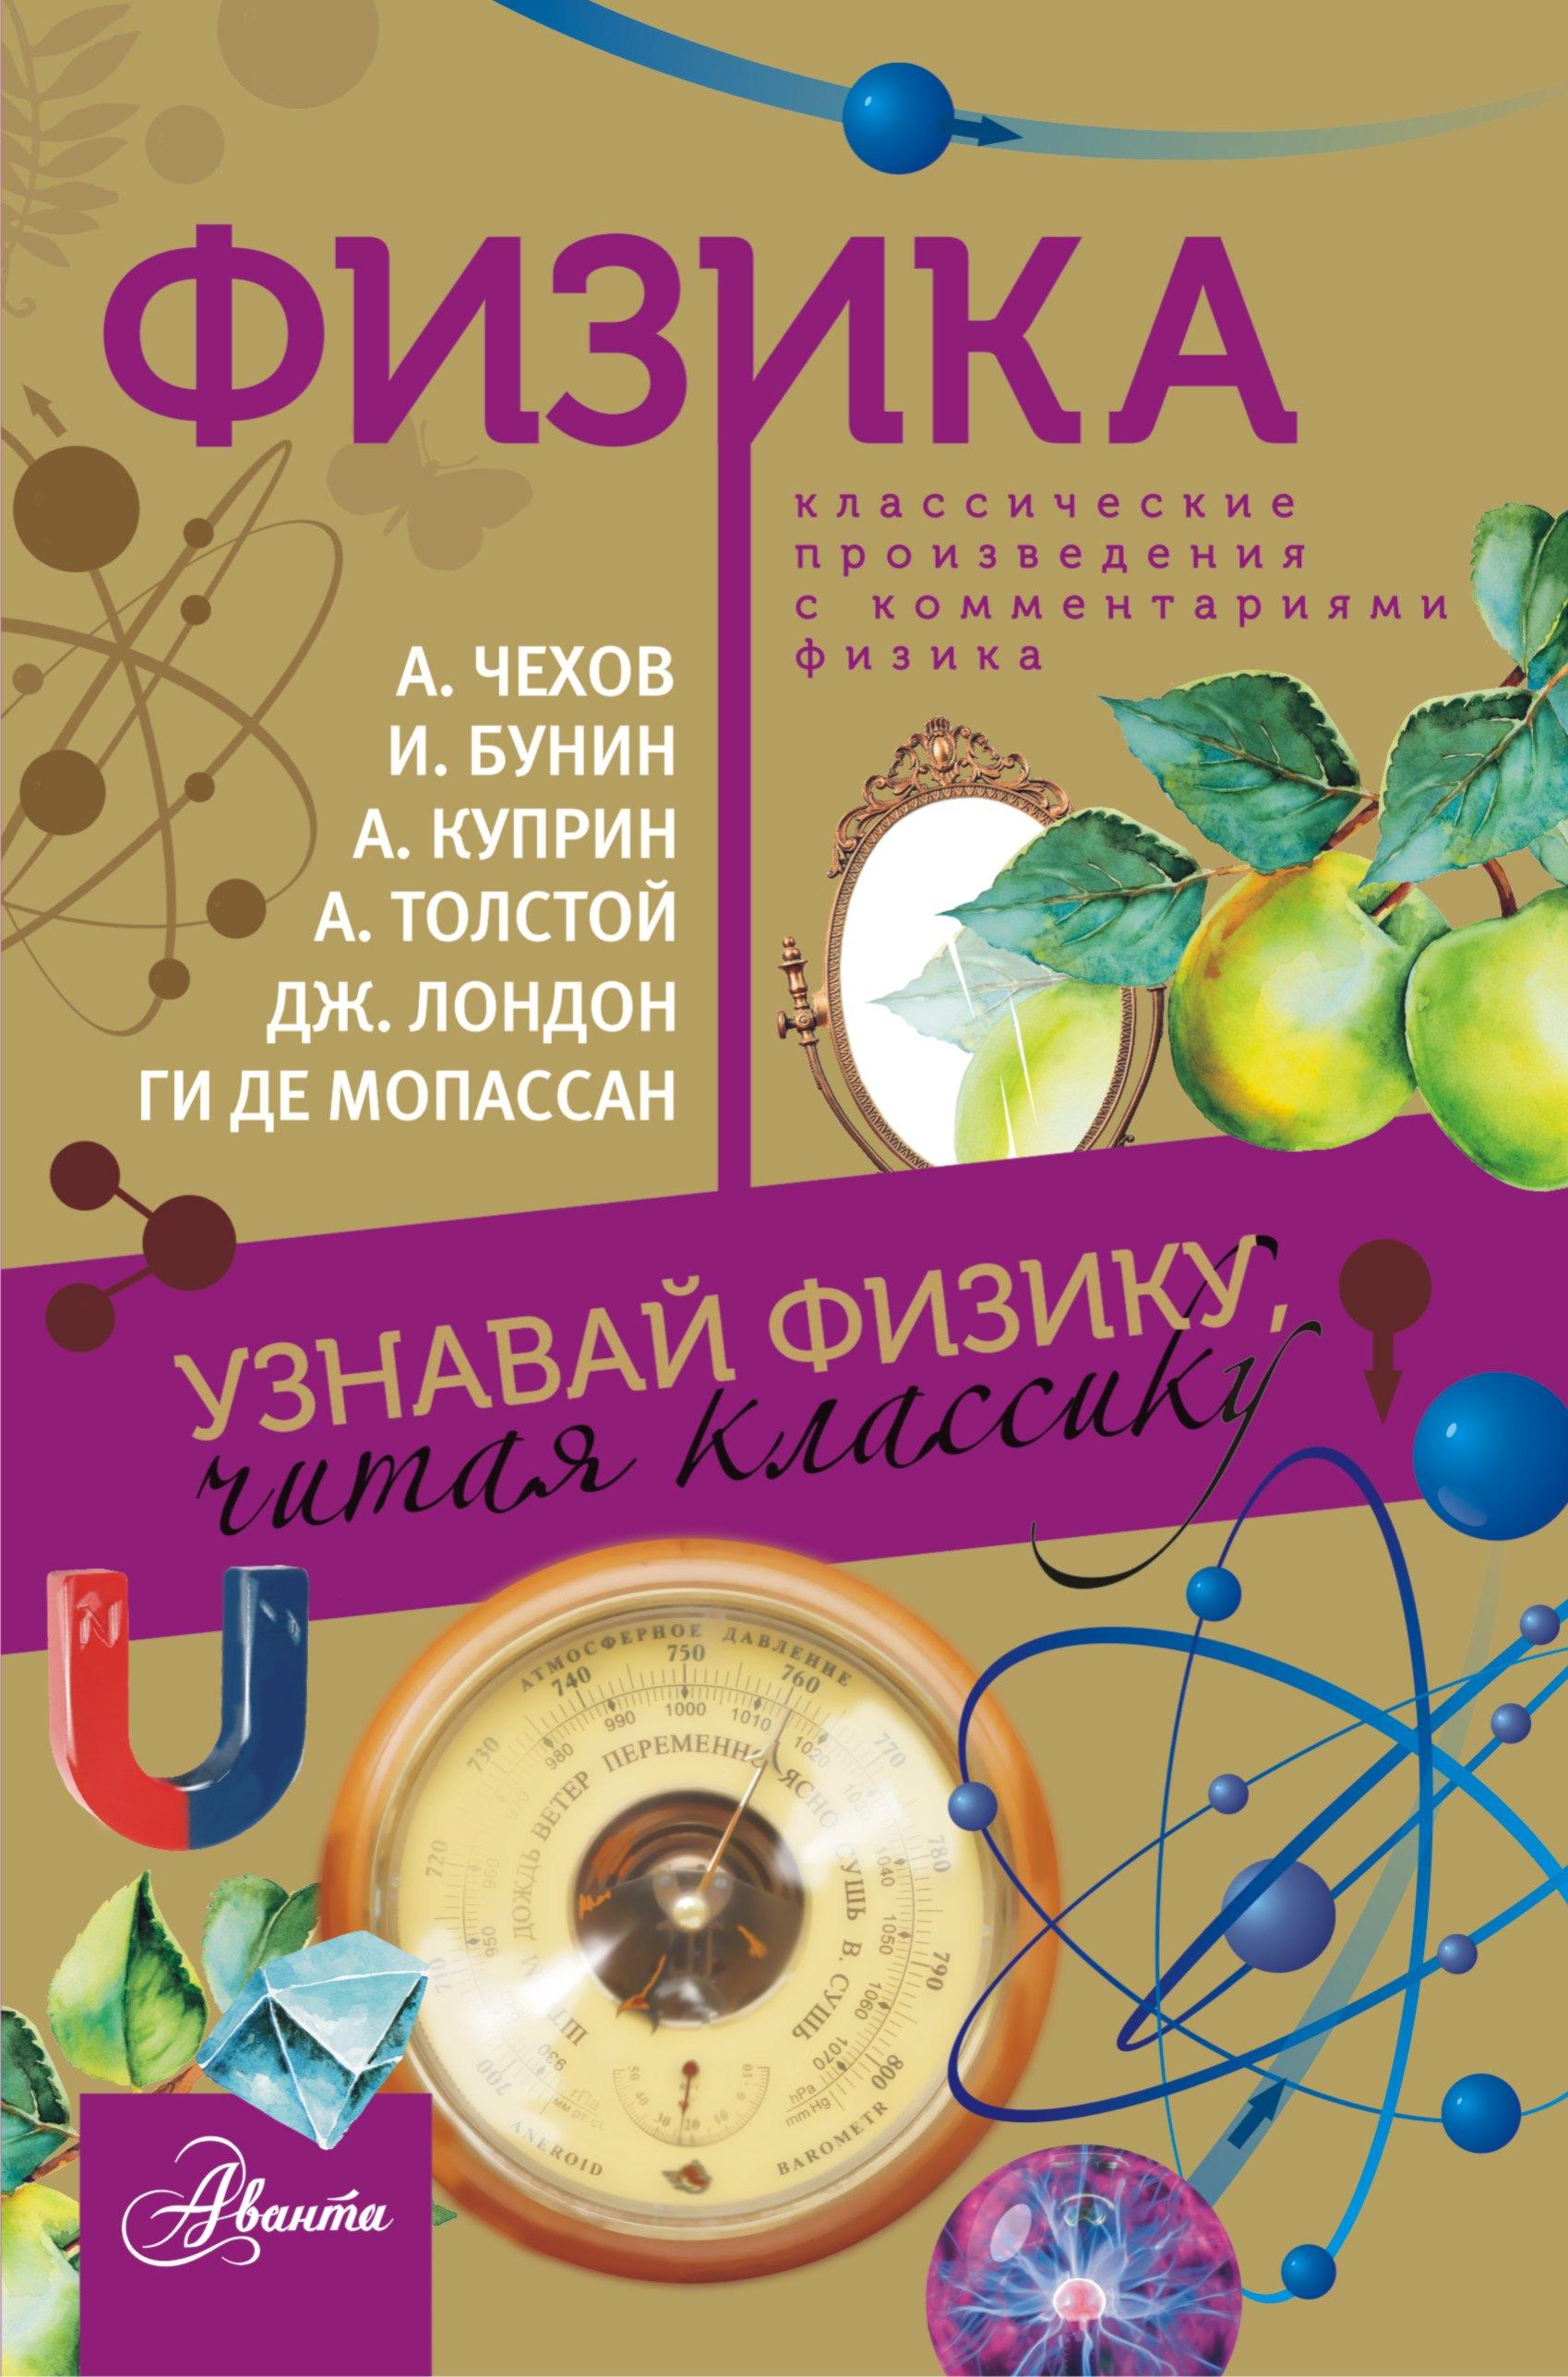 Лагин Л.И., Любимов Н.М., Толстой А.Н. Физика